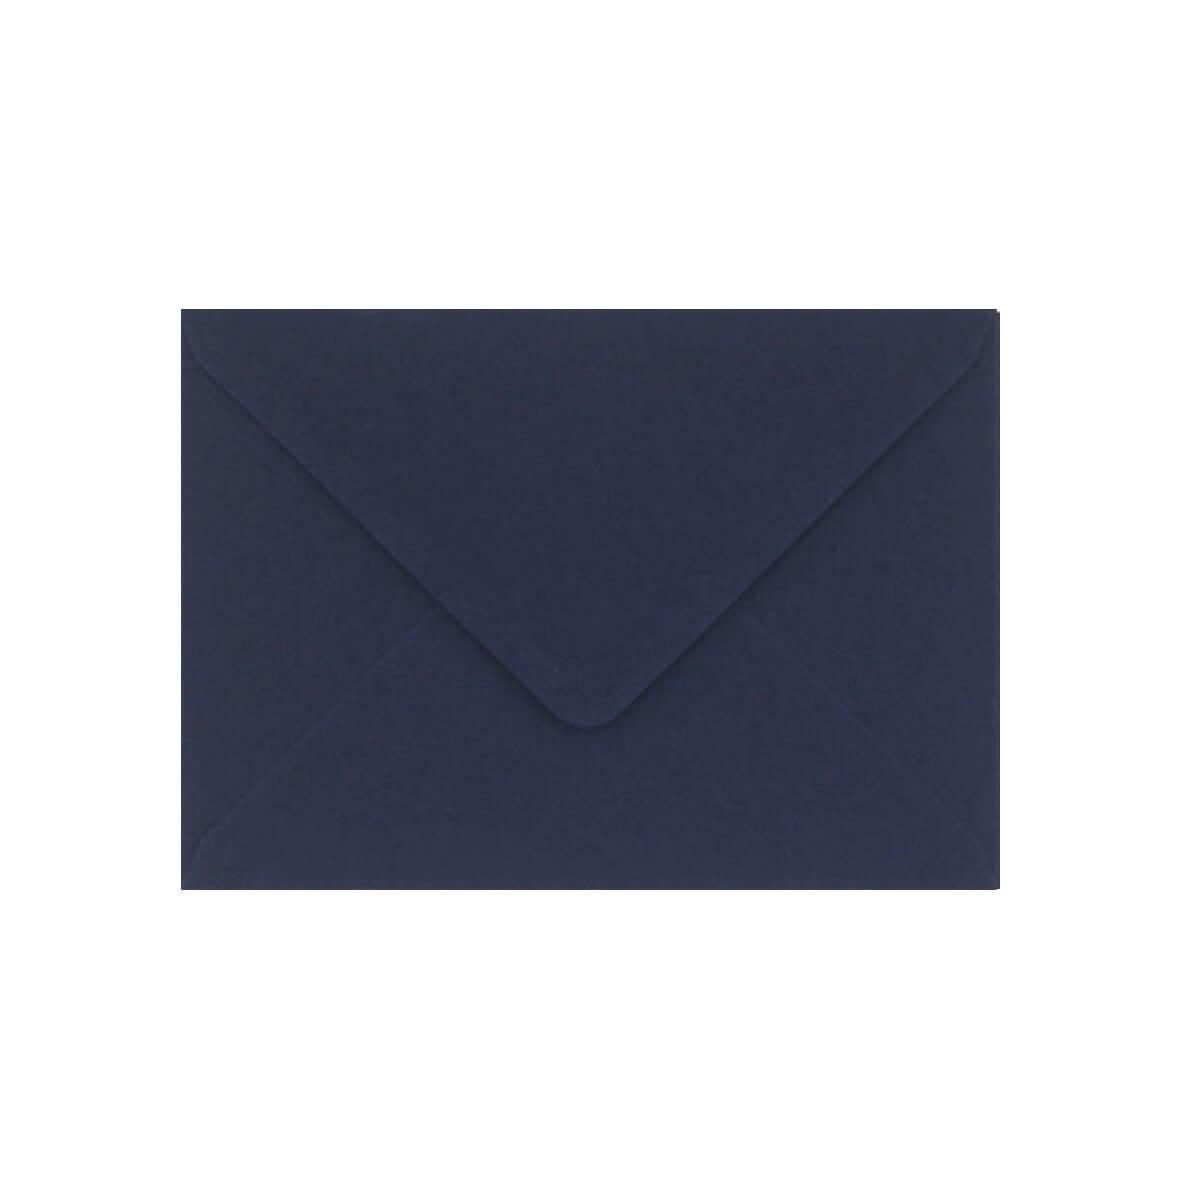 DARK BLUE 133 x 184mm ENVELOPES